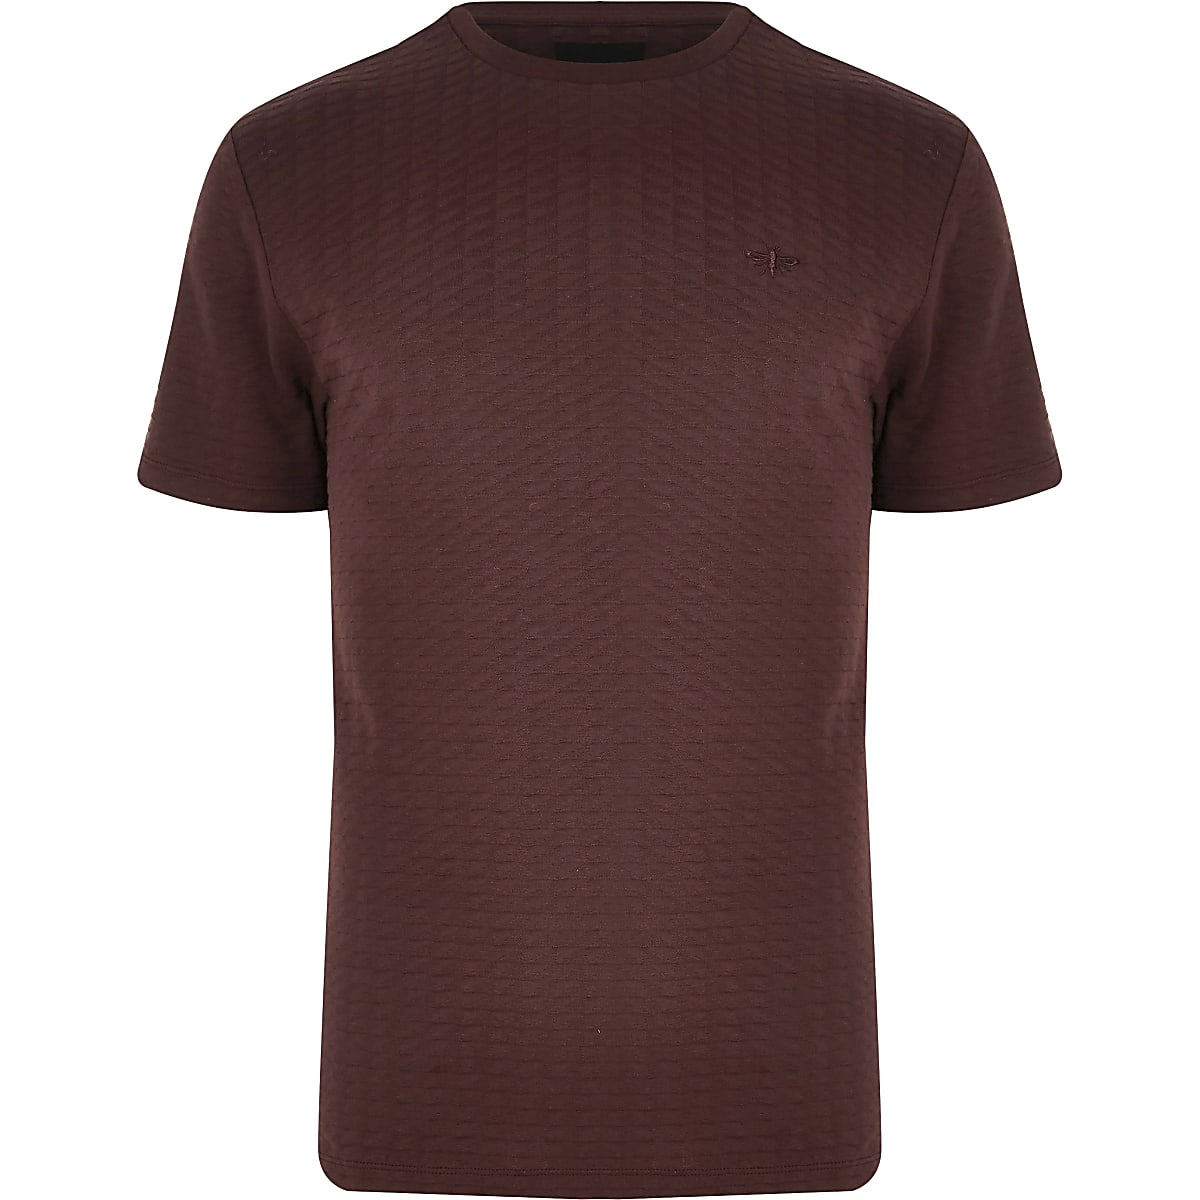 Big and Tall - Rood T-shirt met wafeldessin en korte mouwen